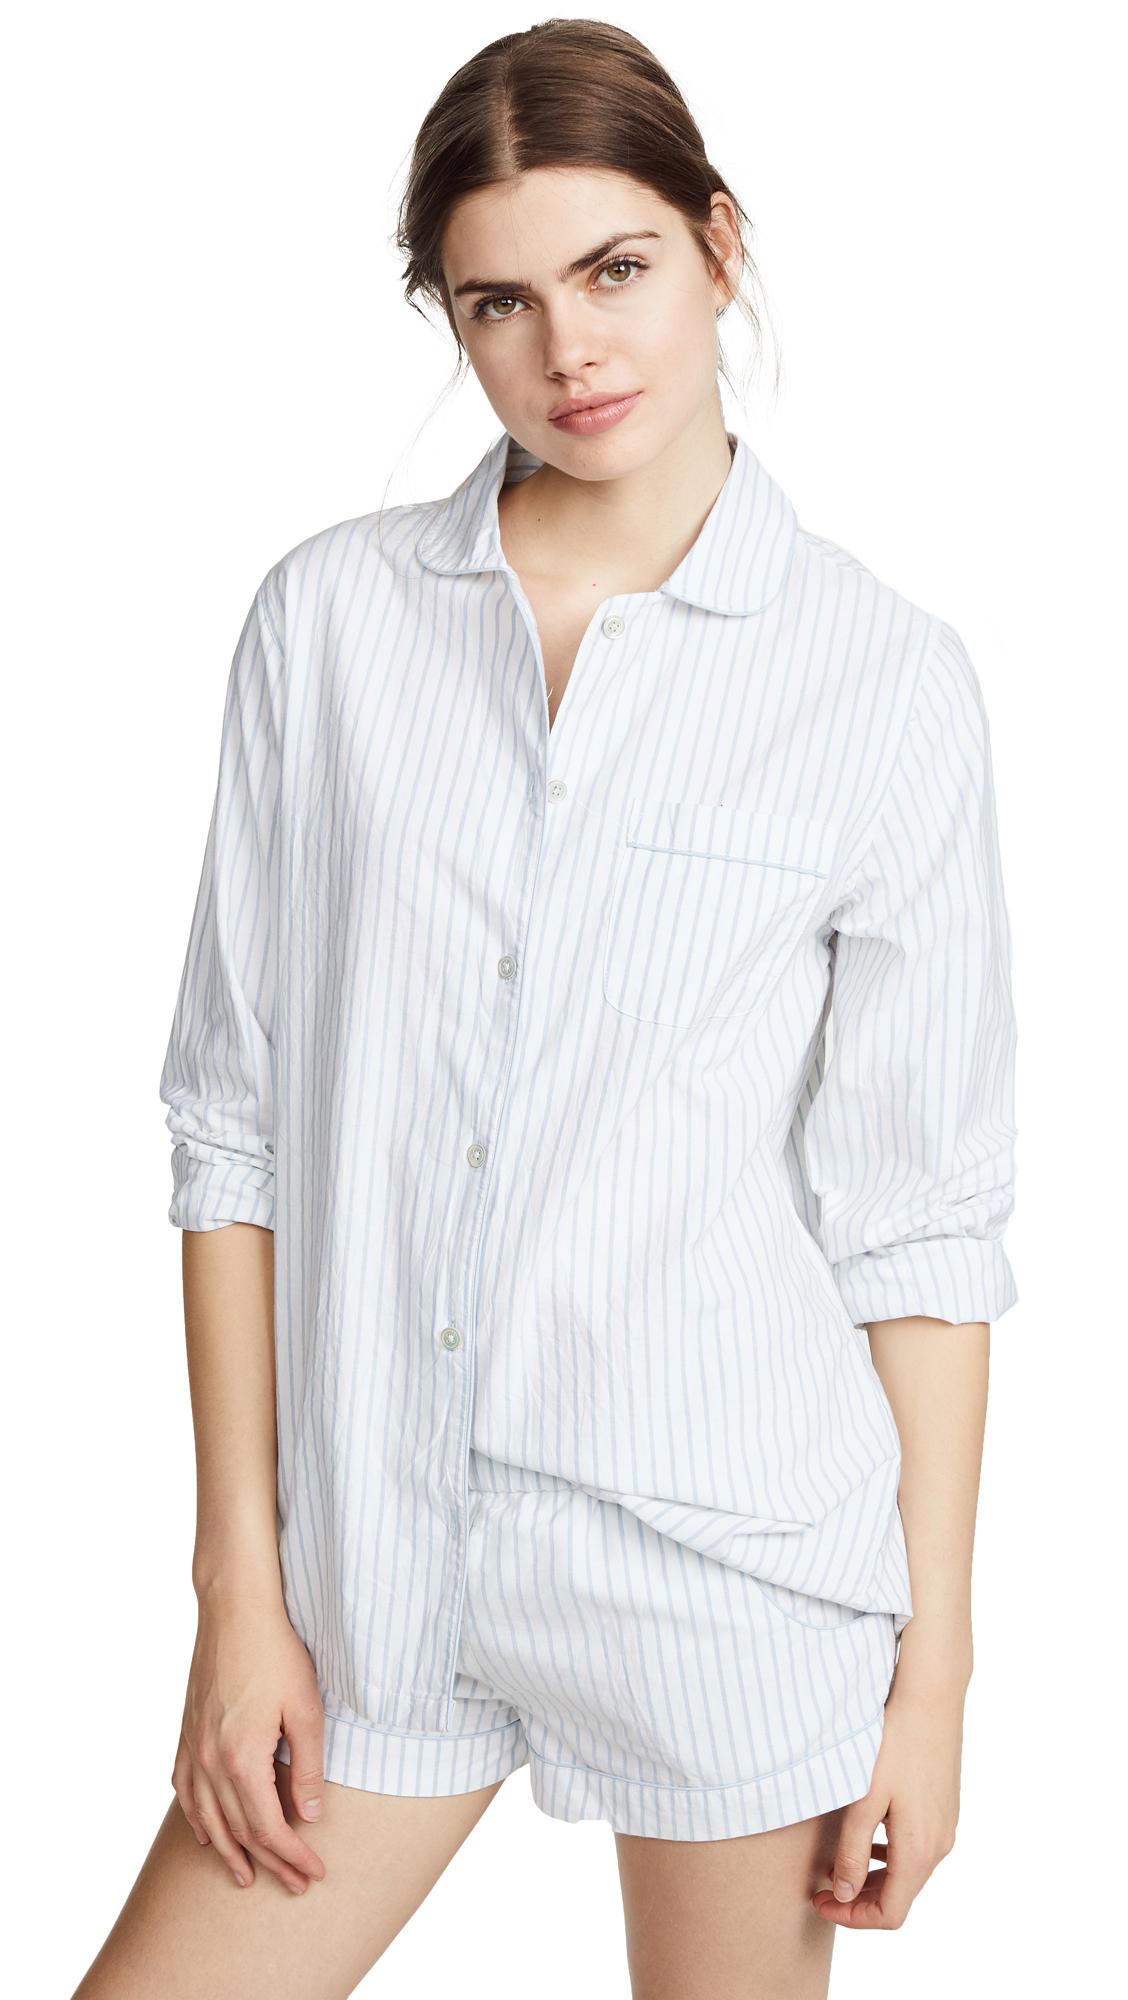 Three J NYC Josephine PJ Set - White With Light Blue Stripe